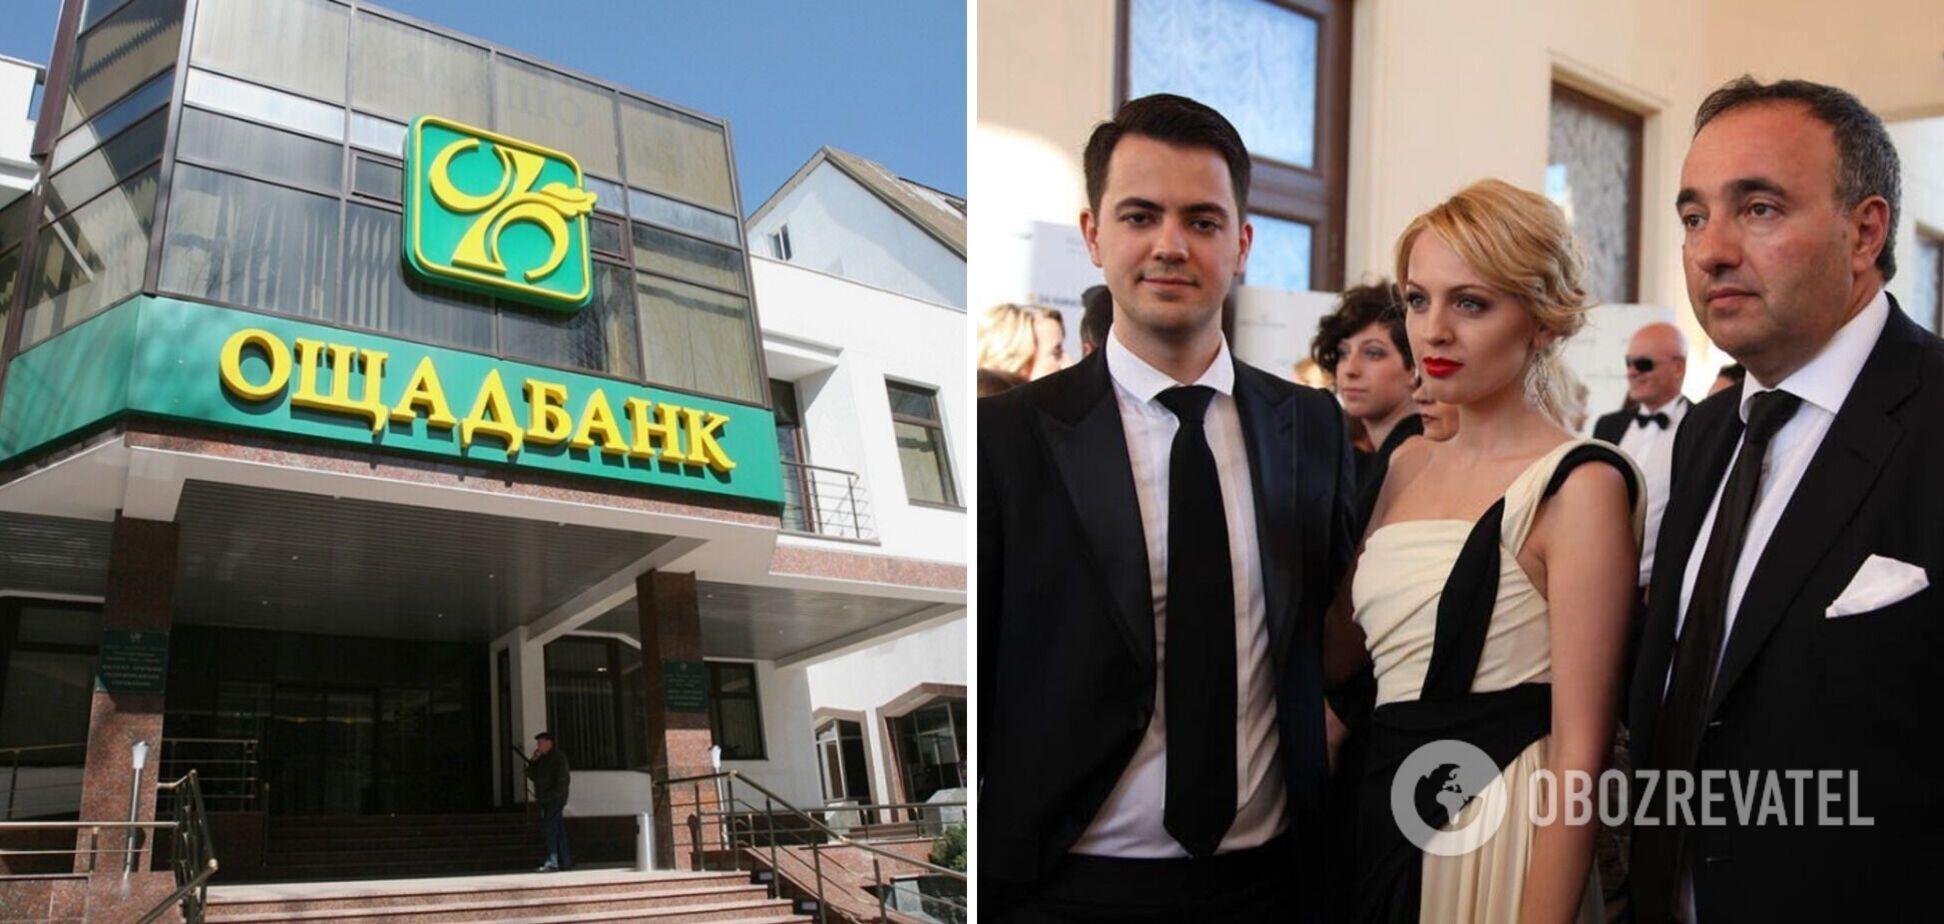 Роднянский-младший стал членом набсовета 'Ощадбанка'